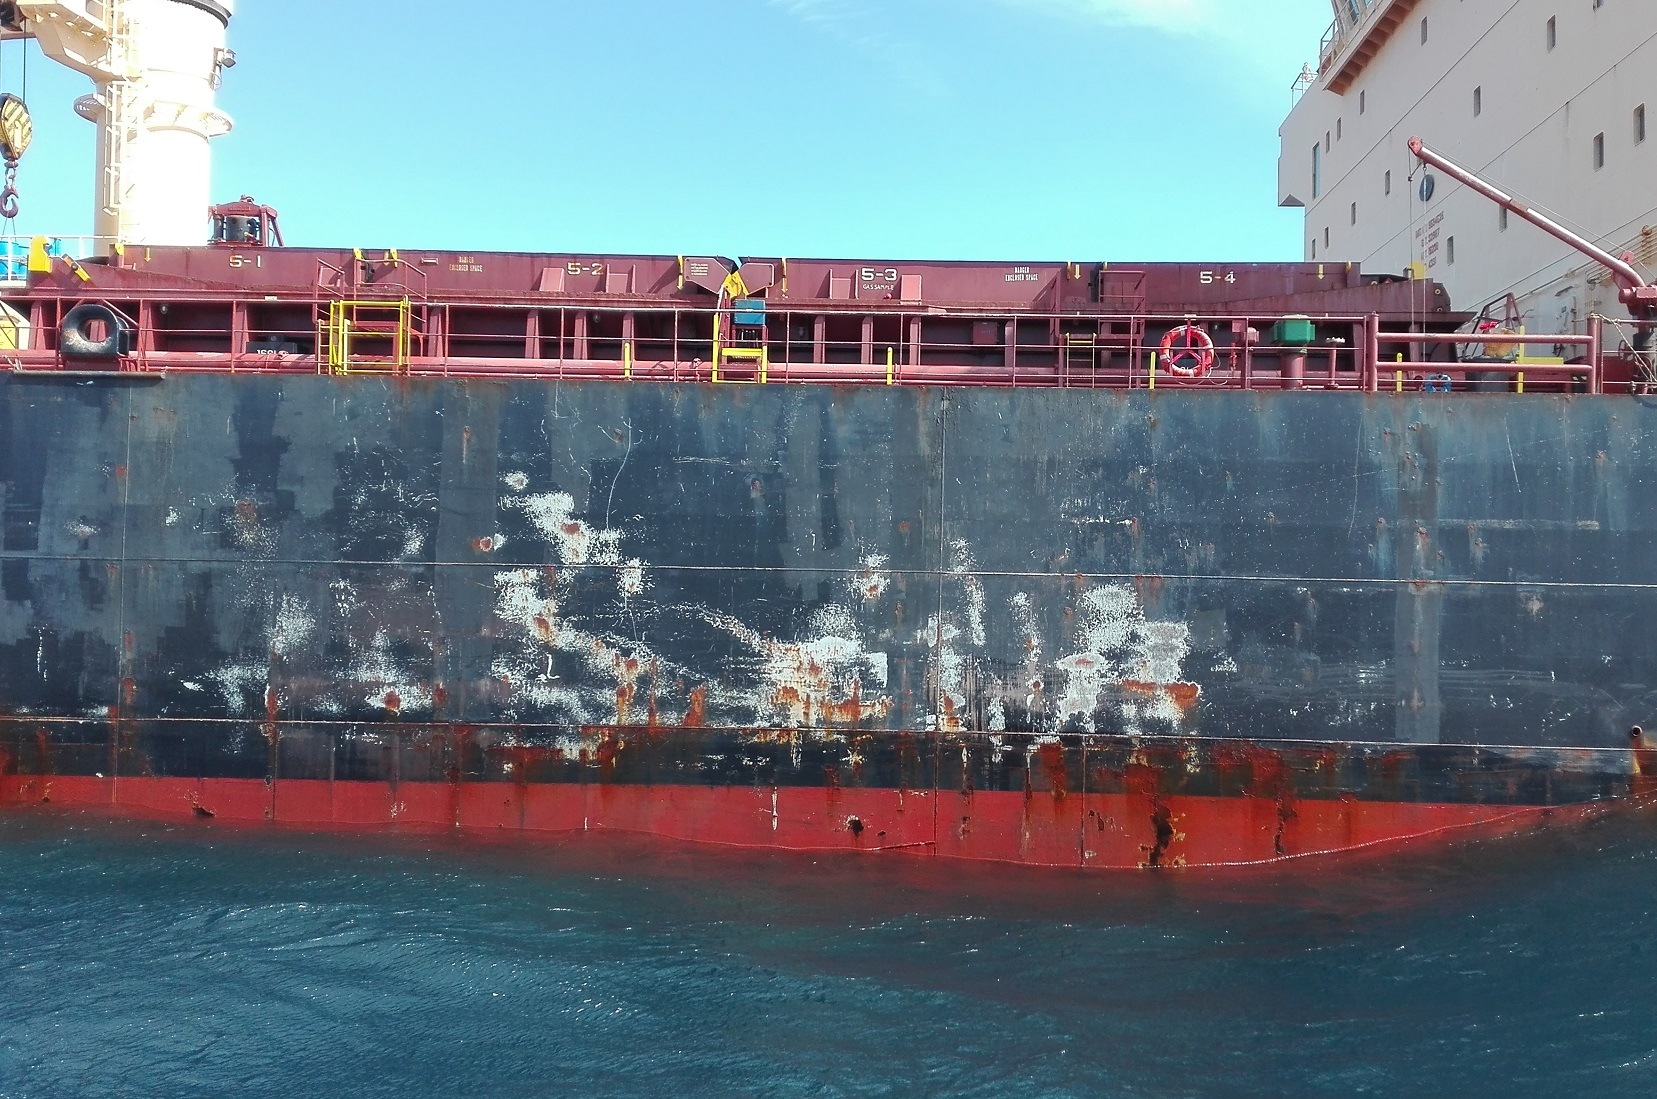 ship-prepurchase-inspection-survey-marine-surveyor-ceuta